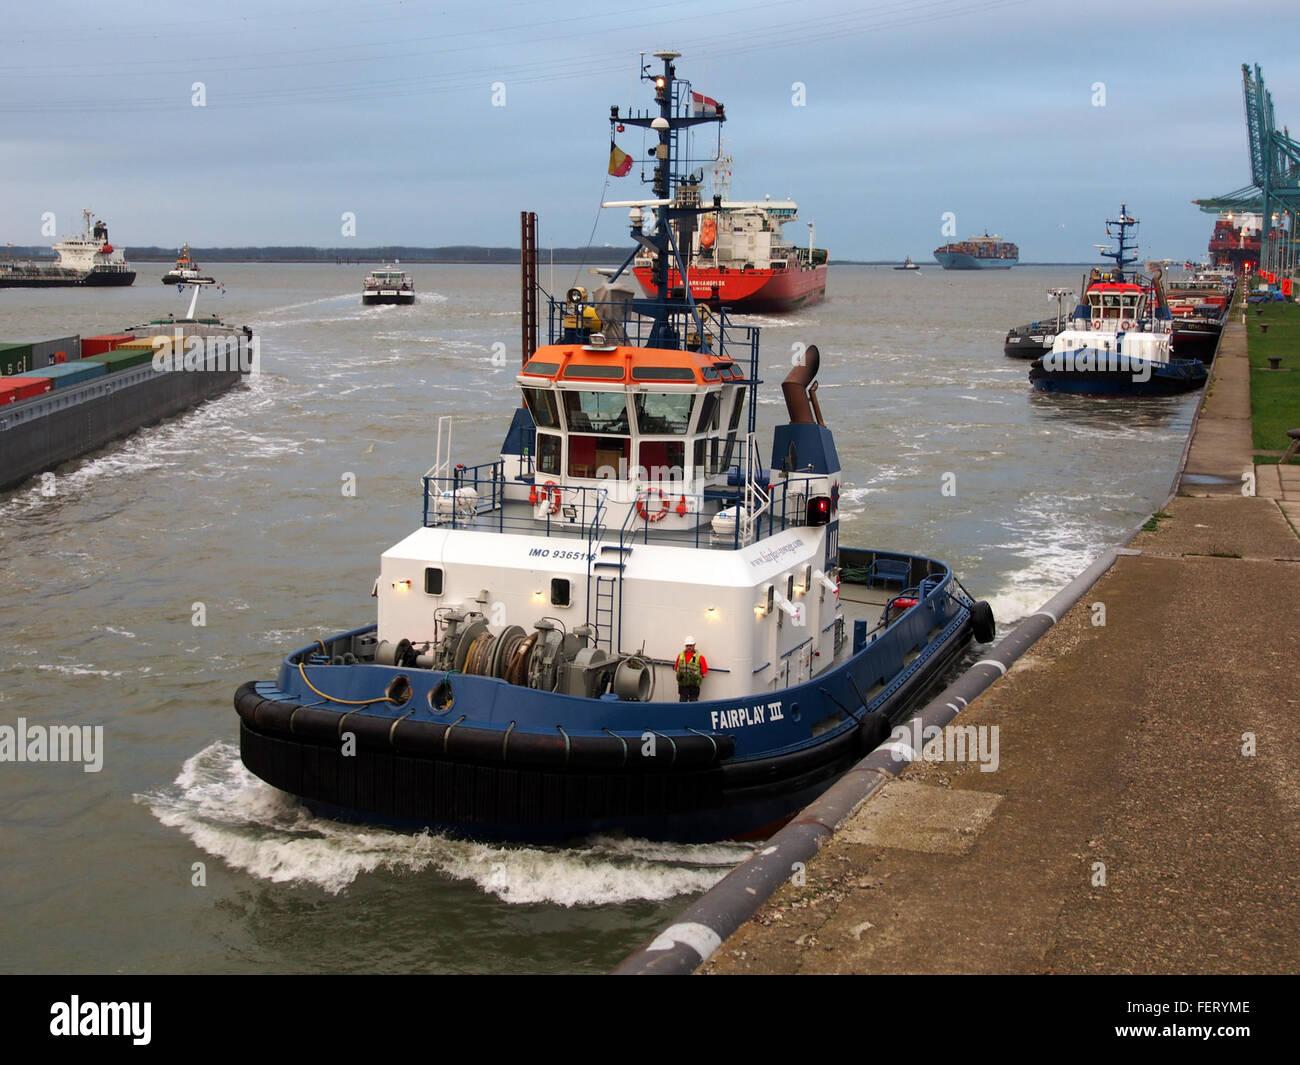 Fairplay (ship, 2007), IMO 9365116, Port of Antwerp - Stock Image